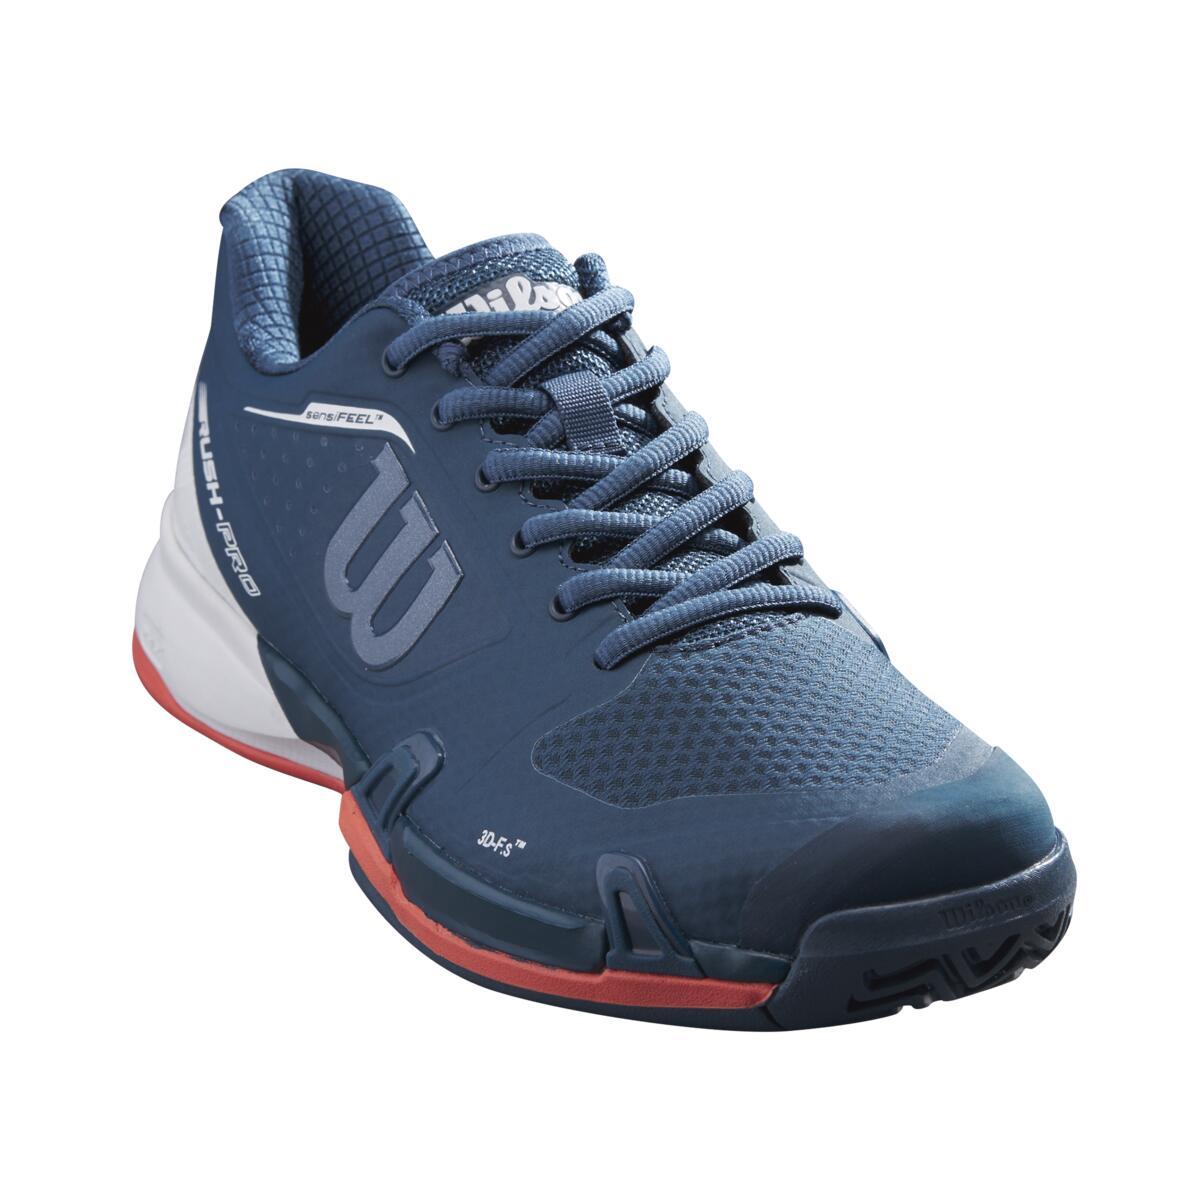 Wilson Rush Pro 2.5 Womens Tennis Shoe – Majolica Blue/White/Hot Coral